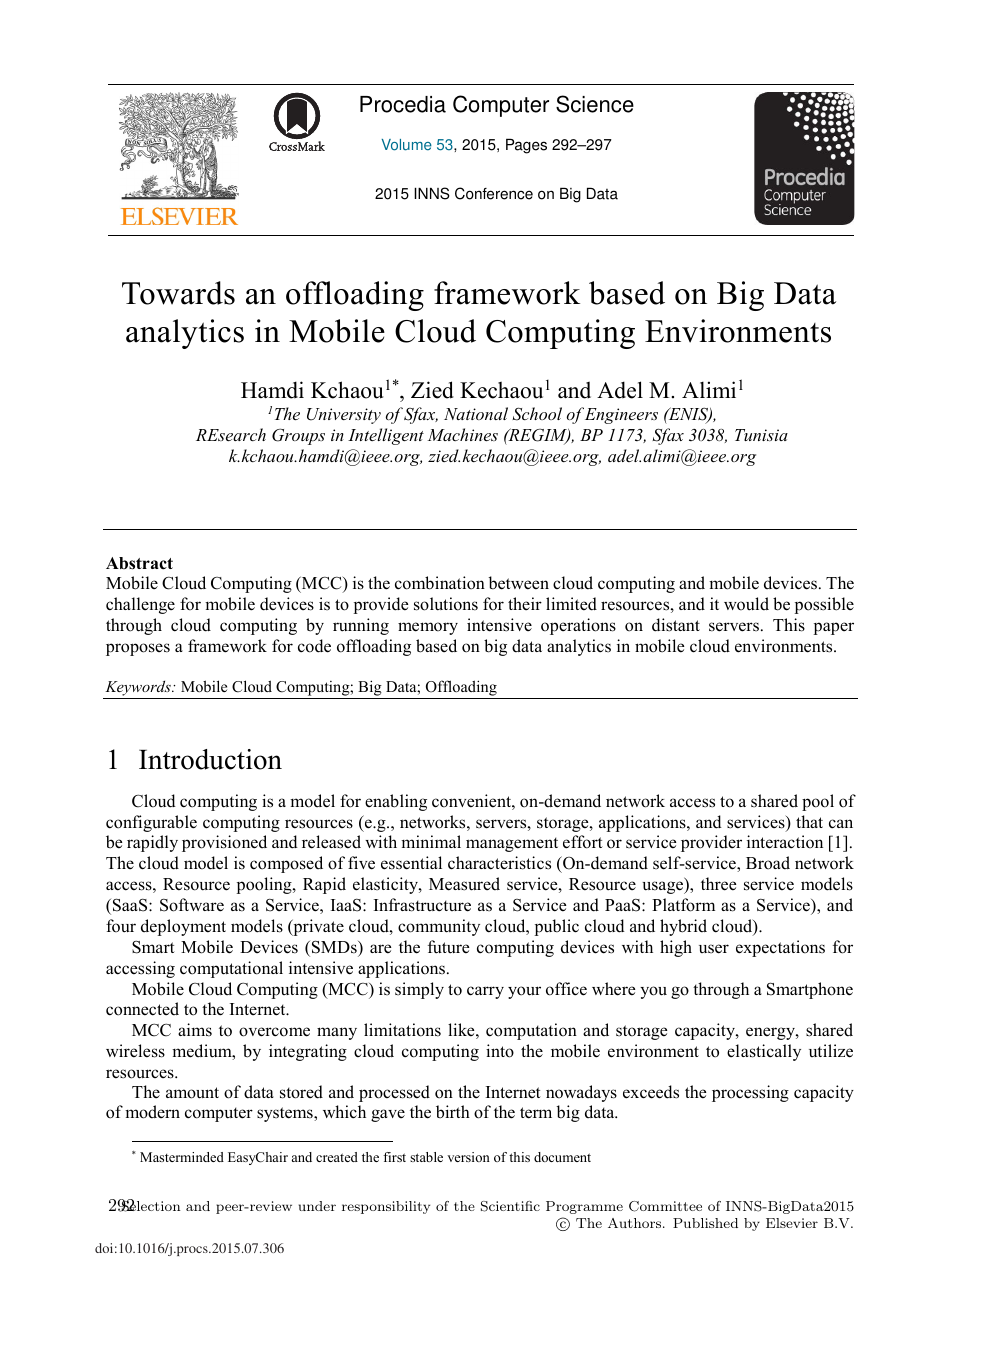 Towards an Offloading Framework based on Big Data Analytics in